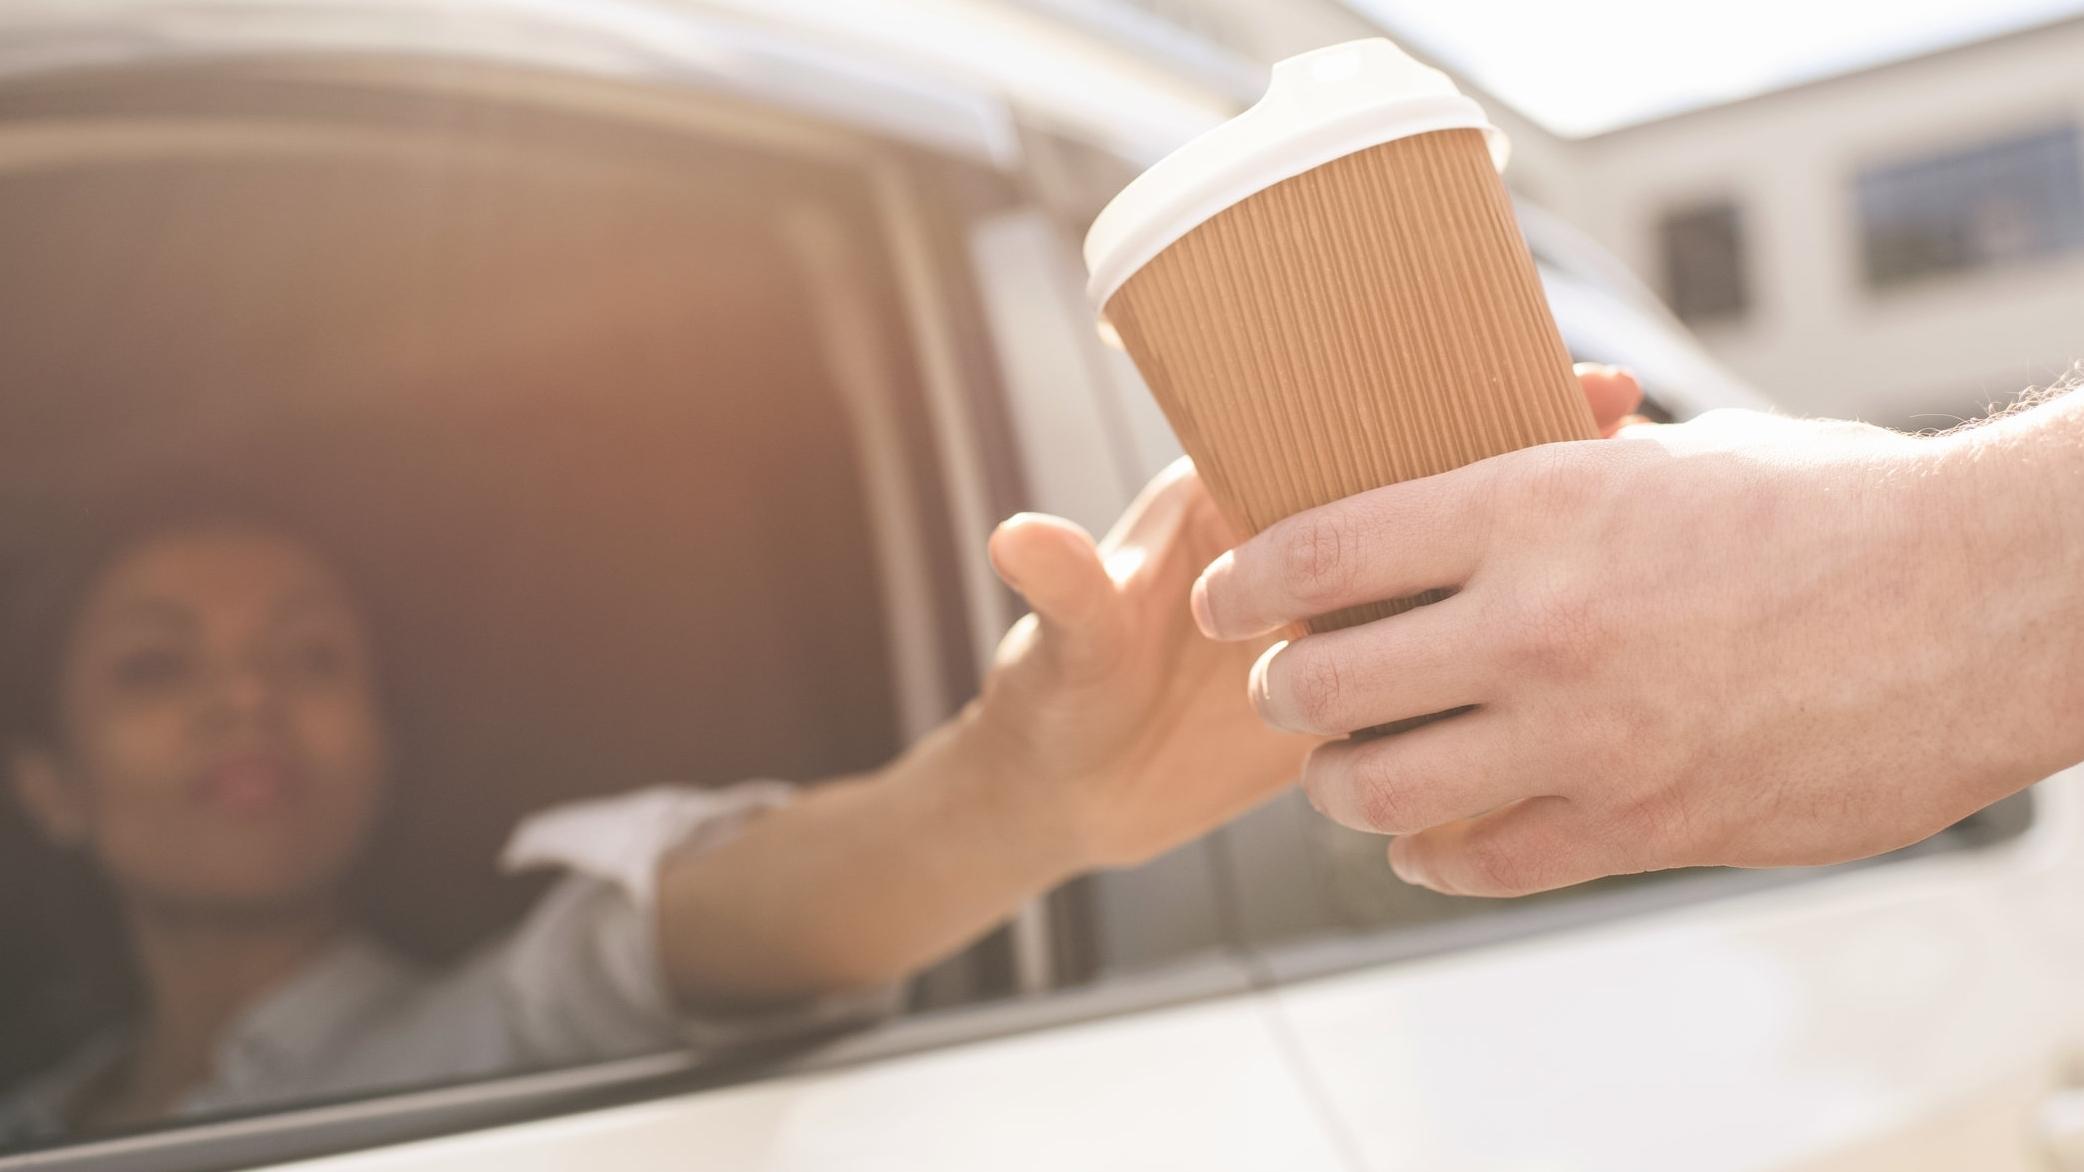 Next generation drive-thru technology. -